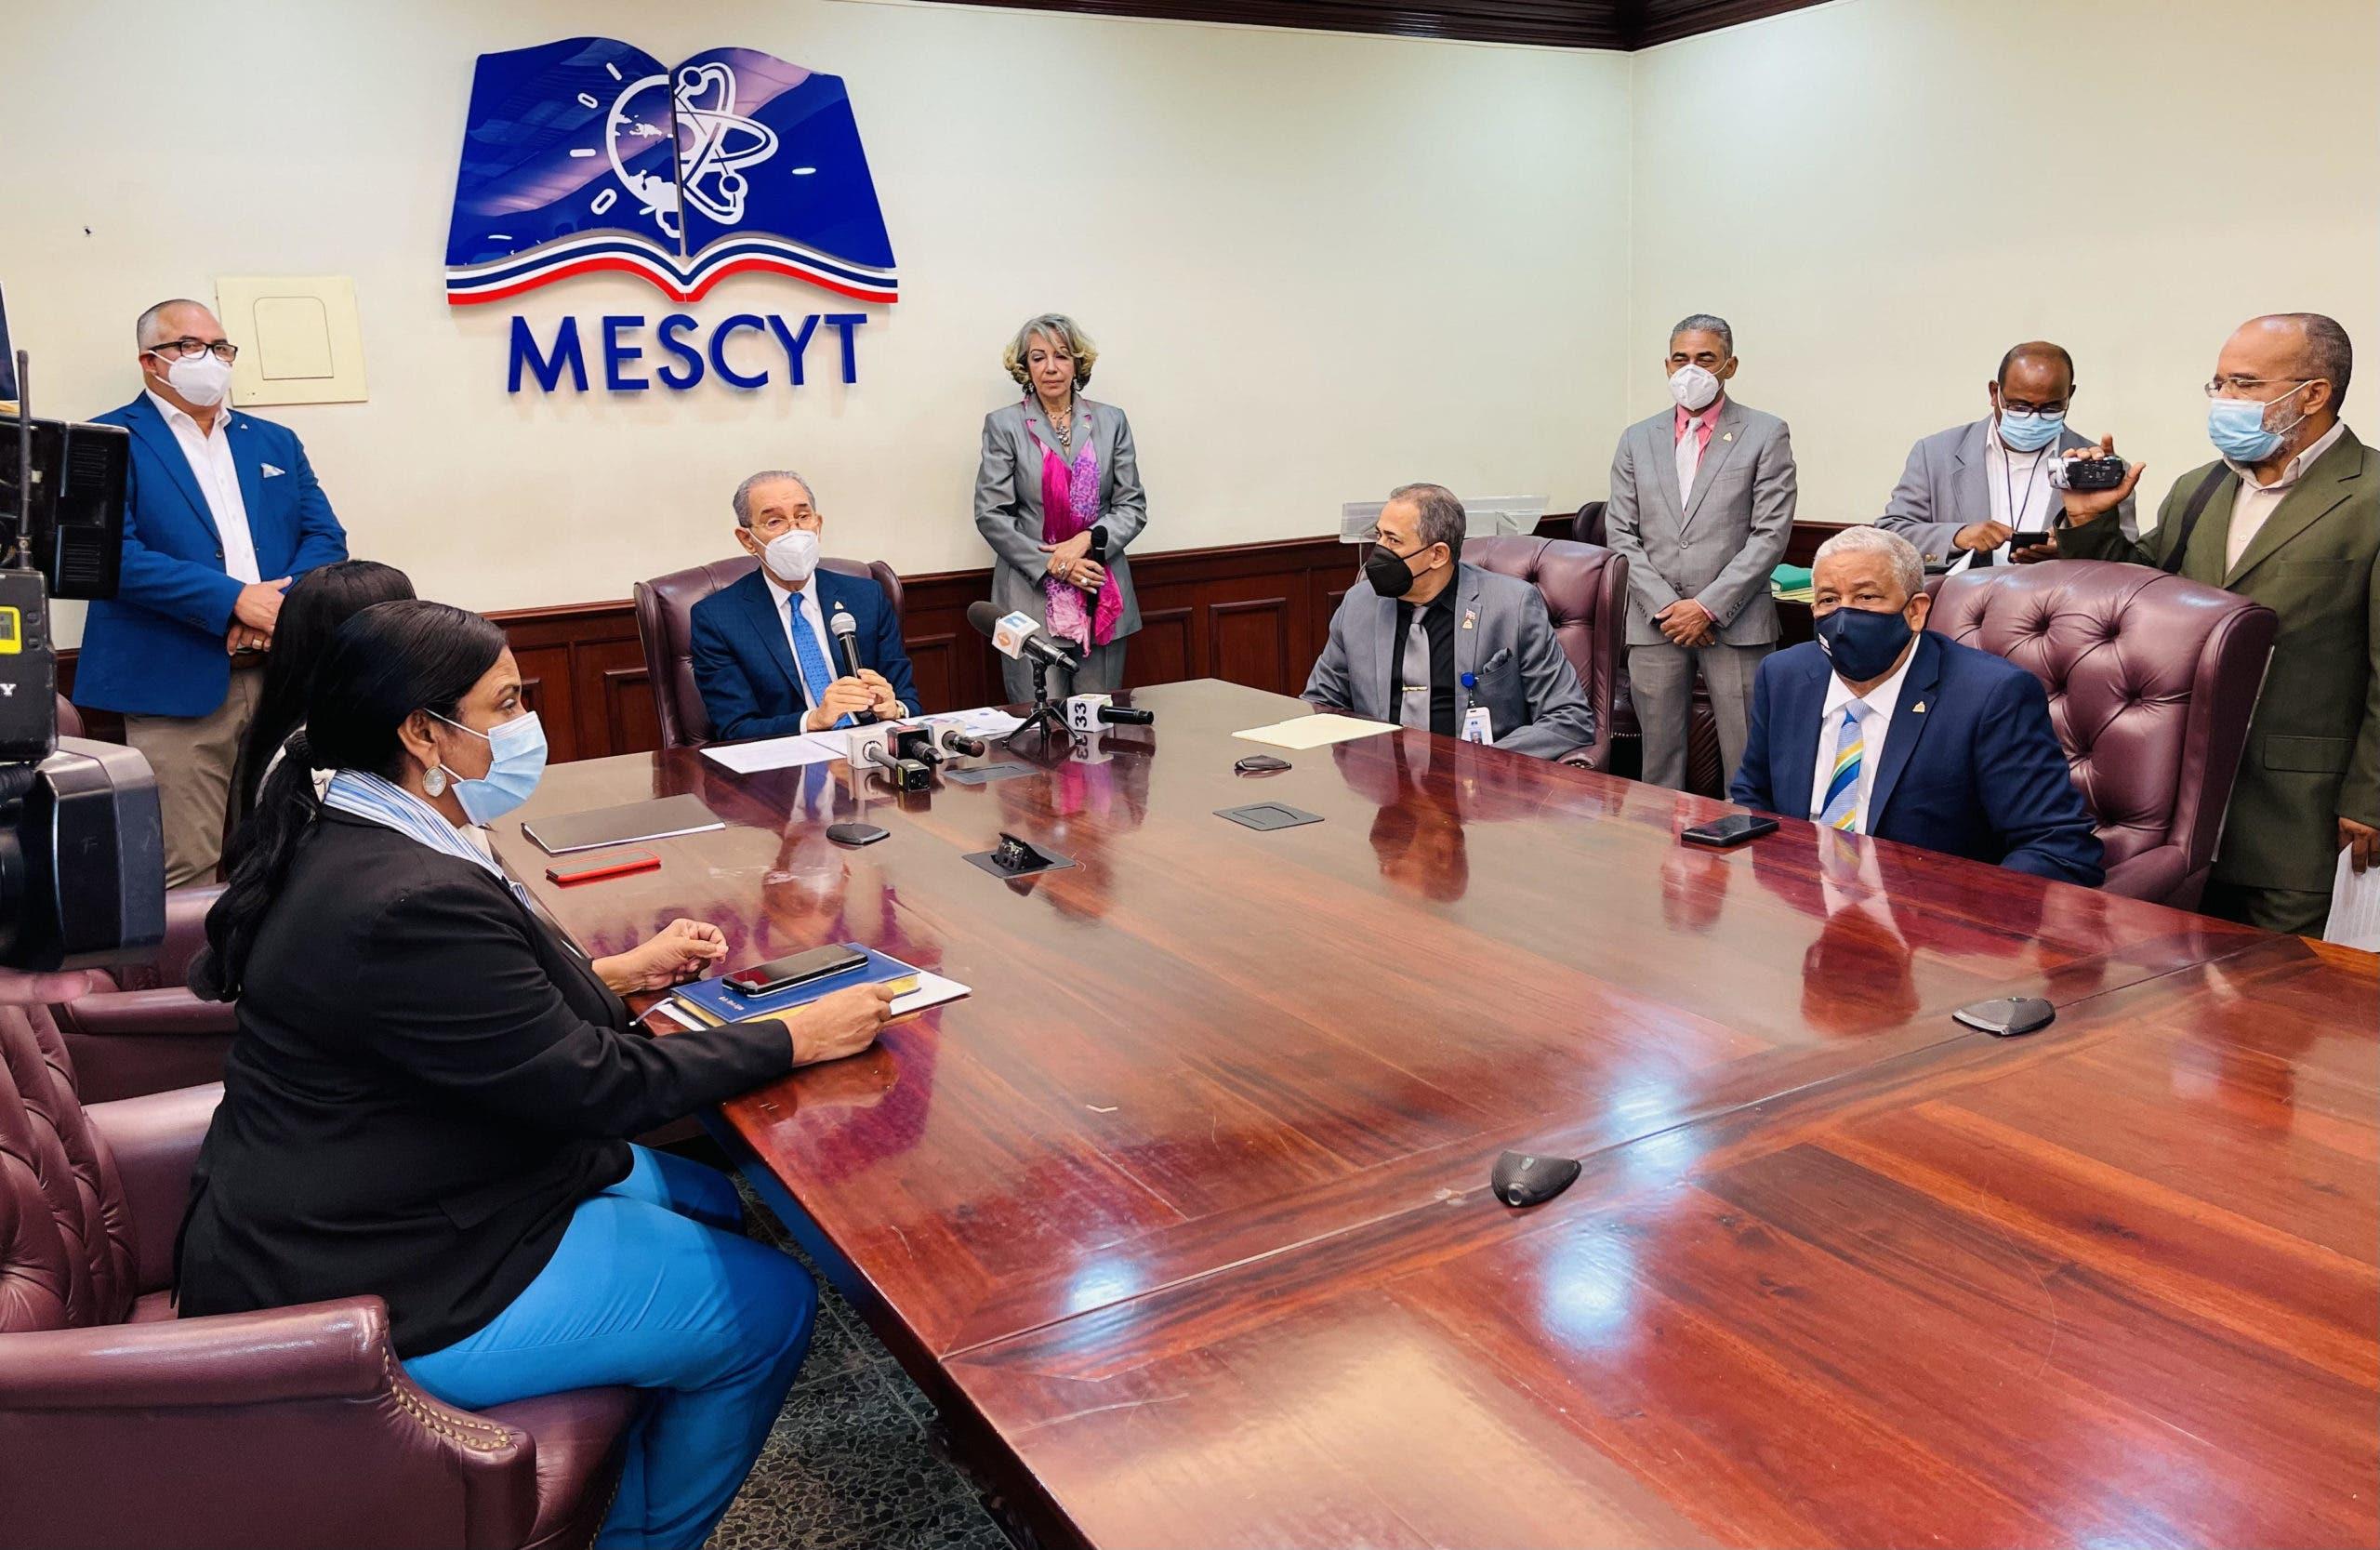 MESCYT abre convocatoria a más de seis mil becas en 40 universidades del país